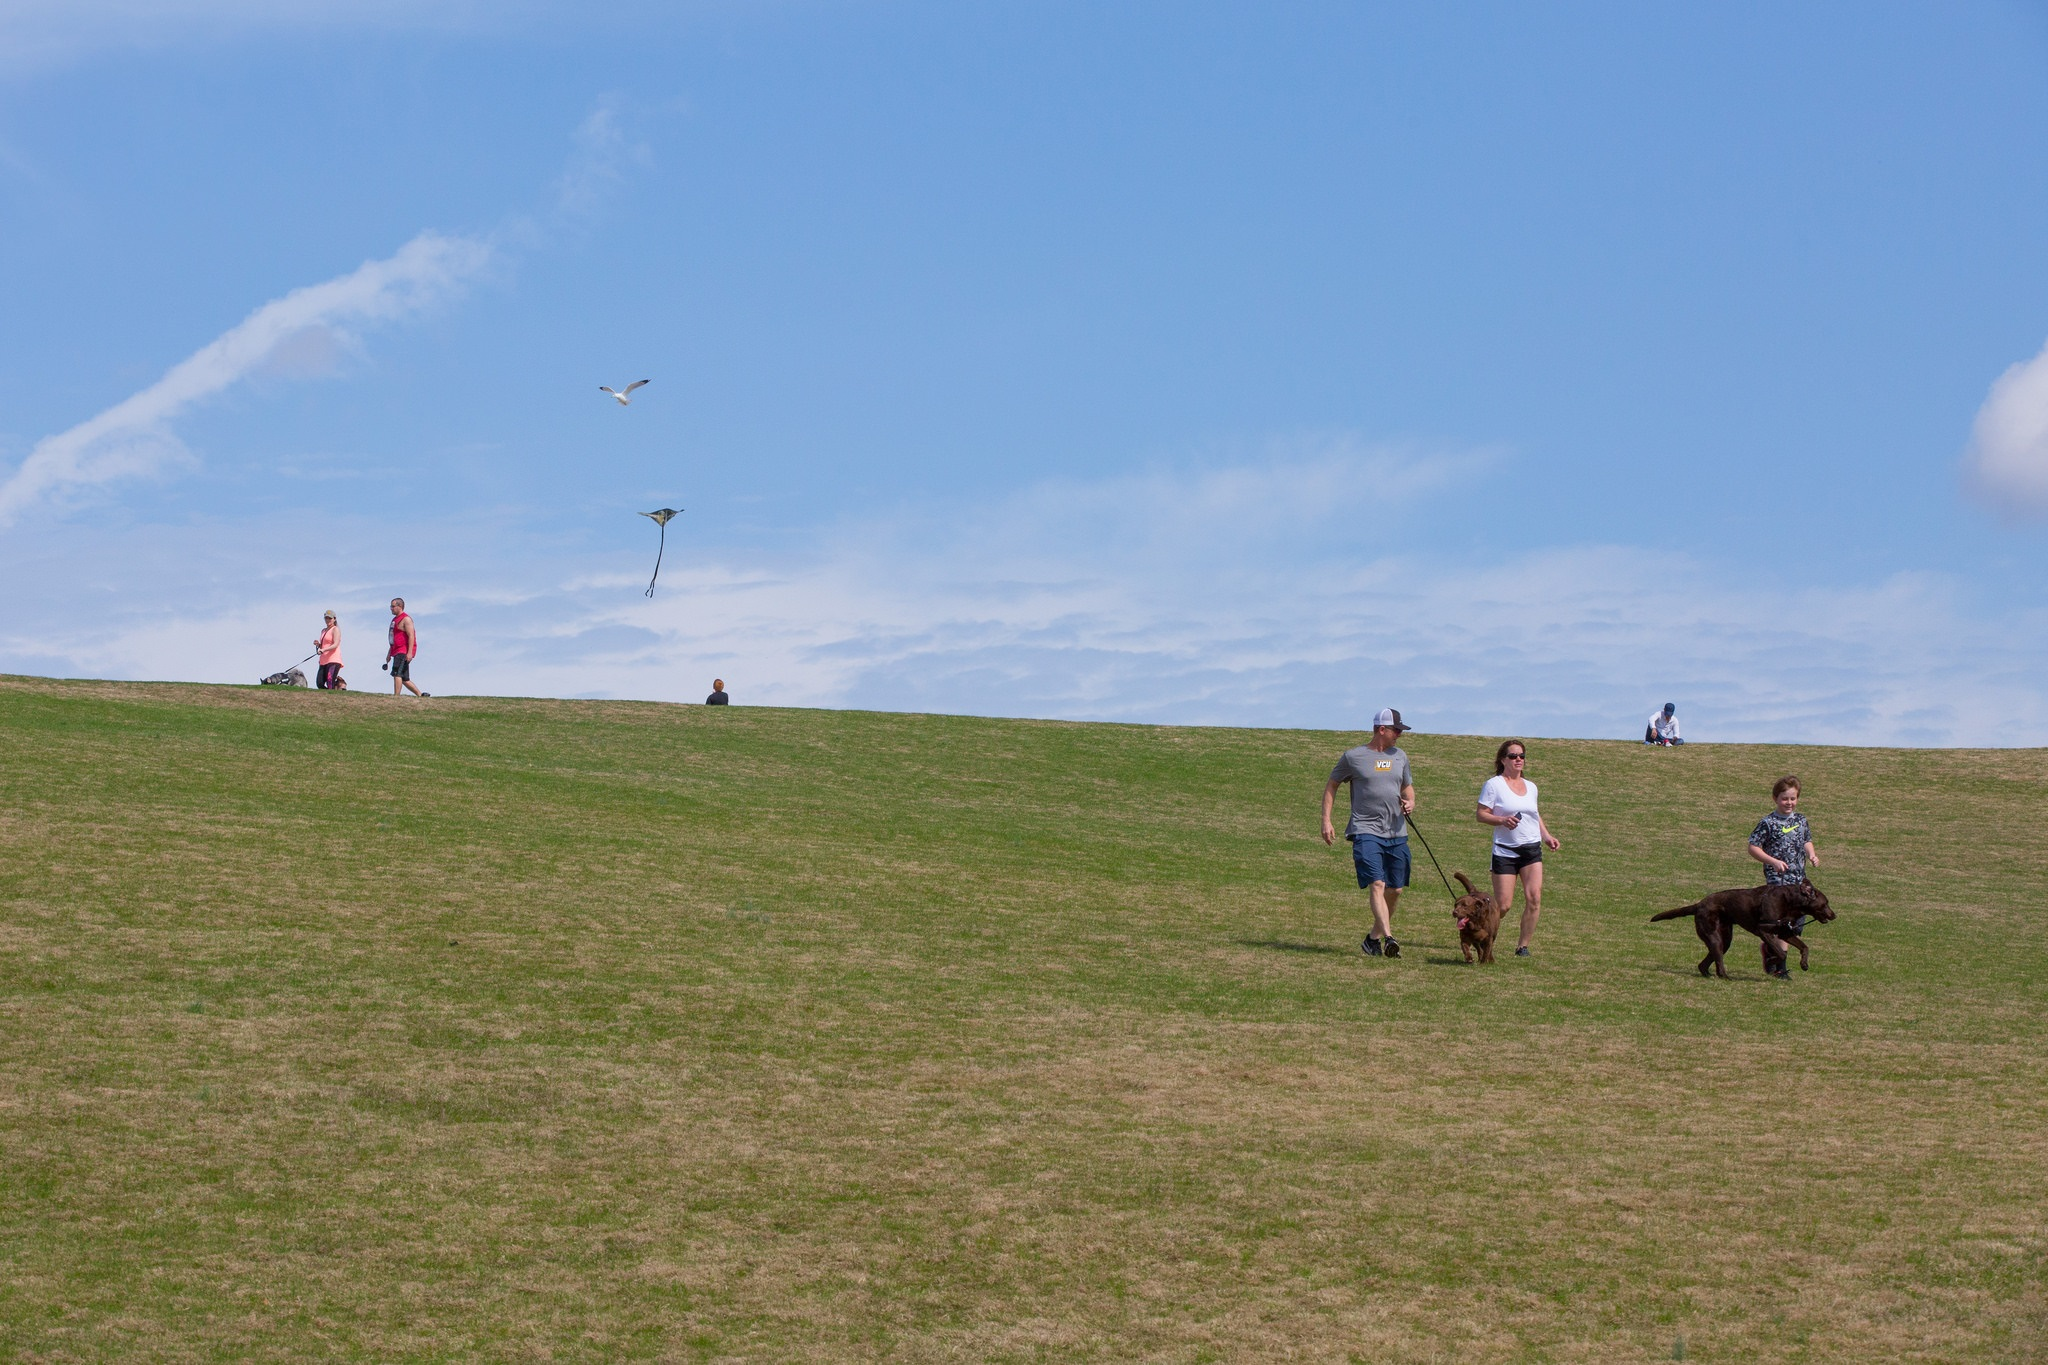 Mount Trashmore Park VB Parks and Rec_1524164263453.jpg.jpg